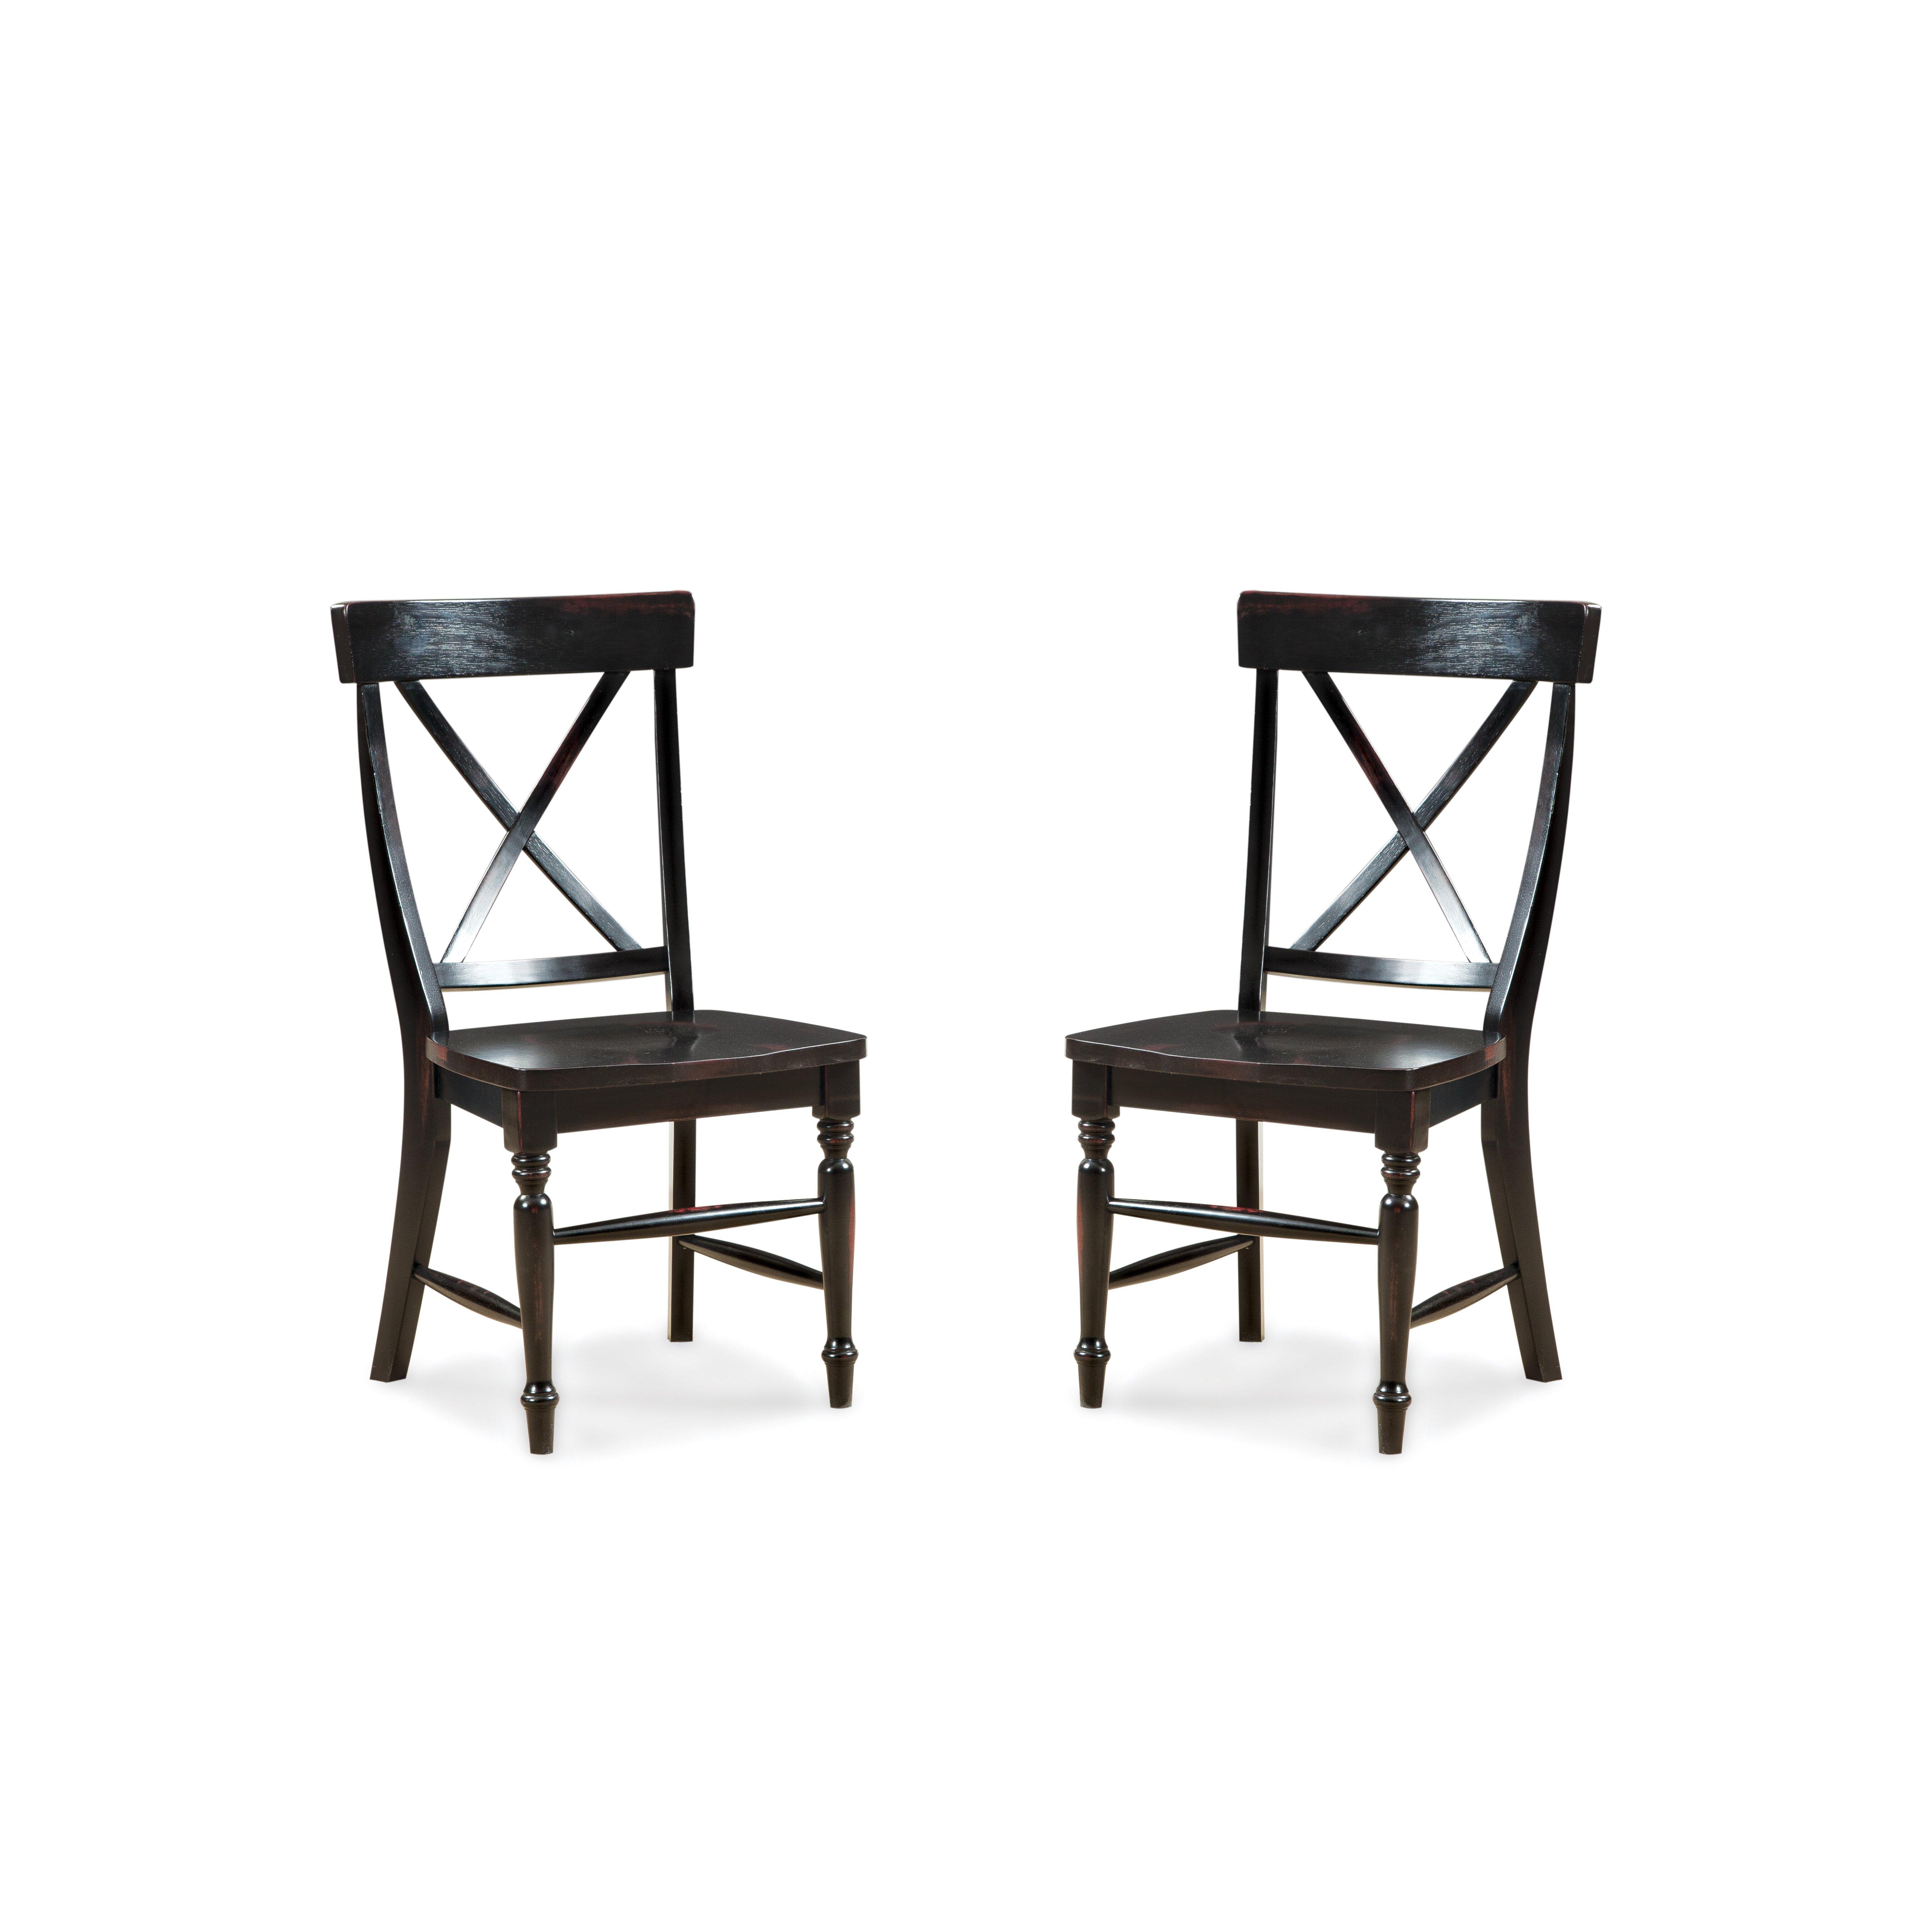 Stool Cushions Rectangular Rectangular Bar Stools Haste